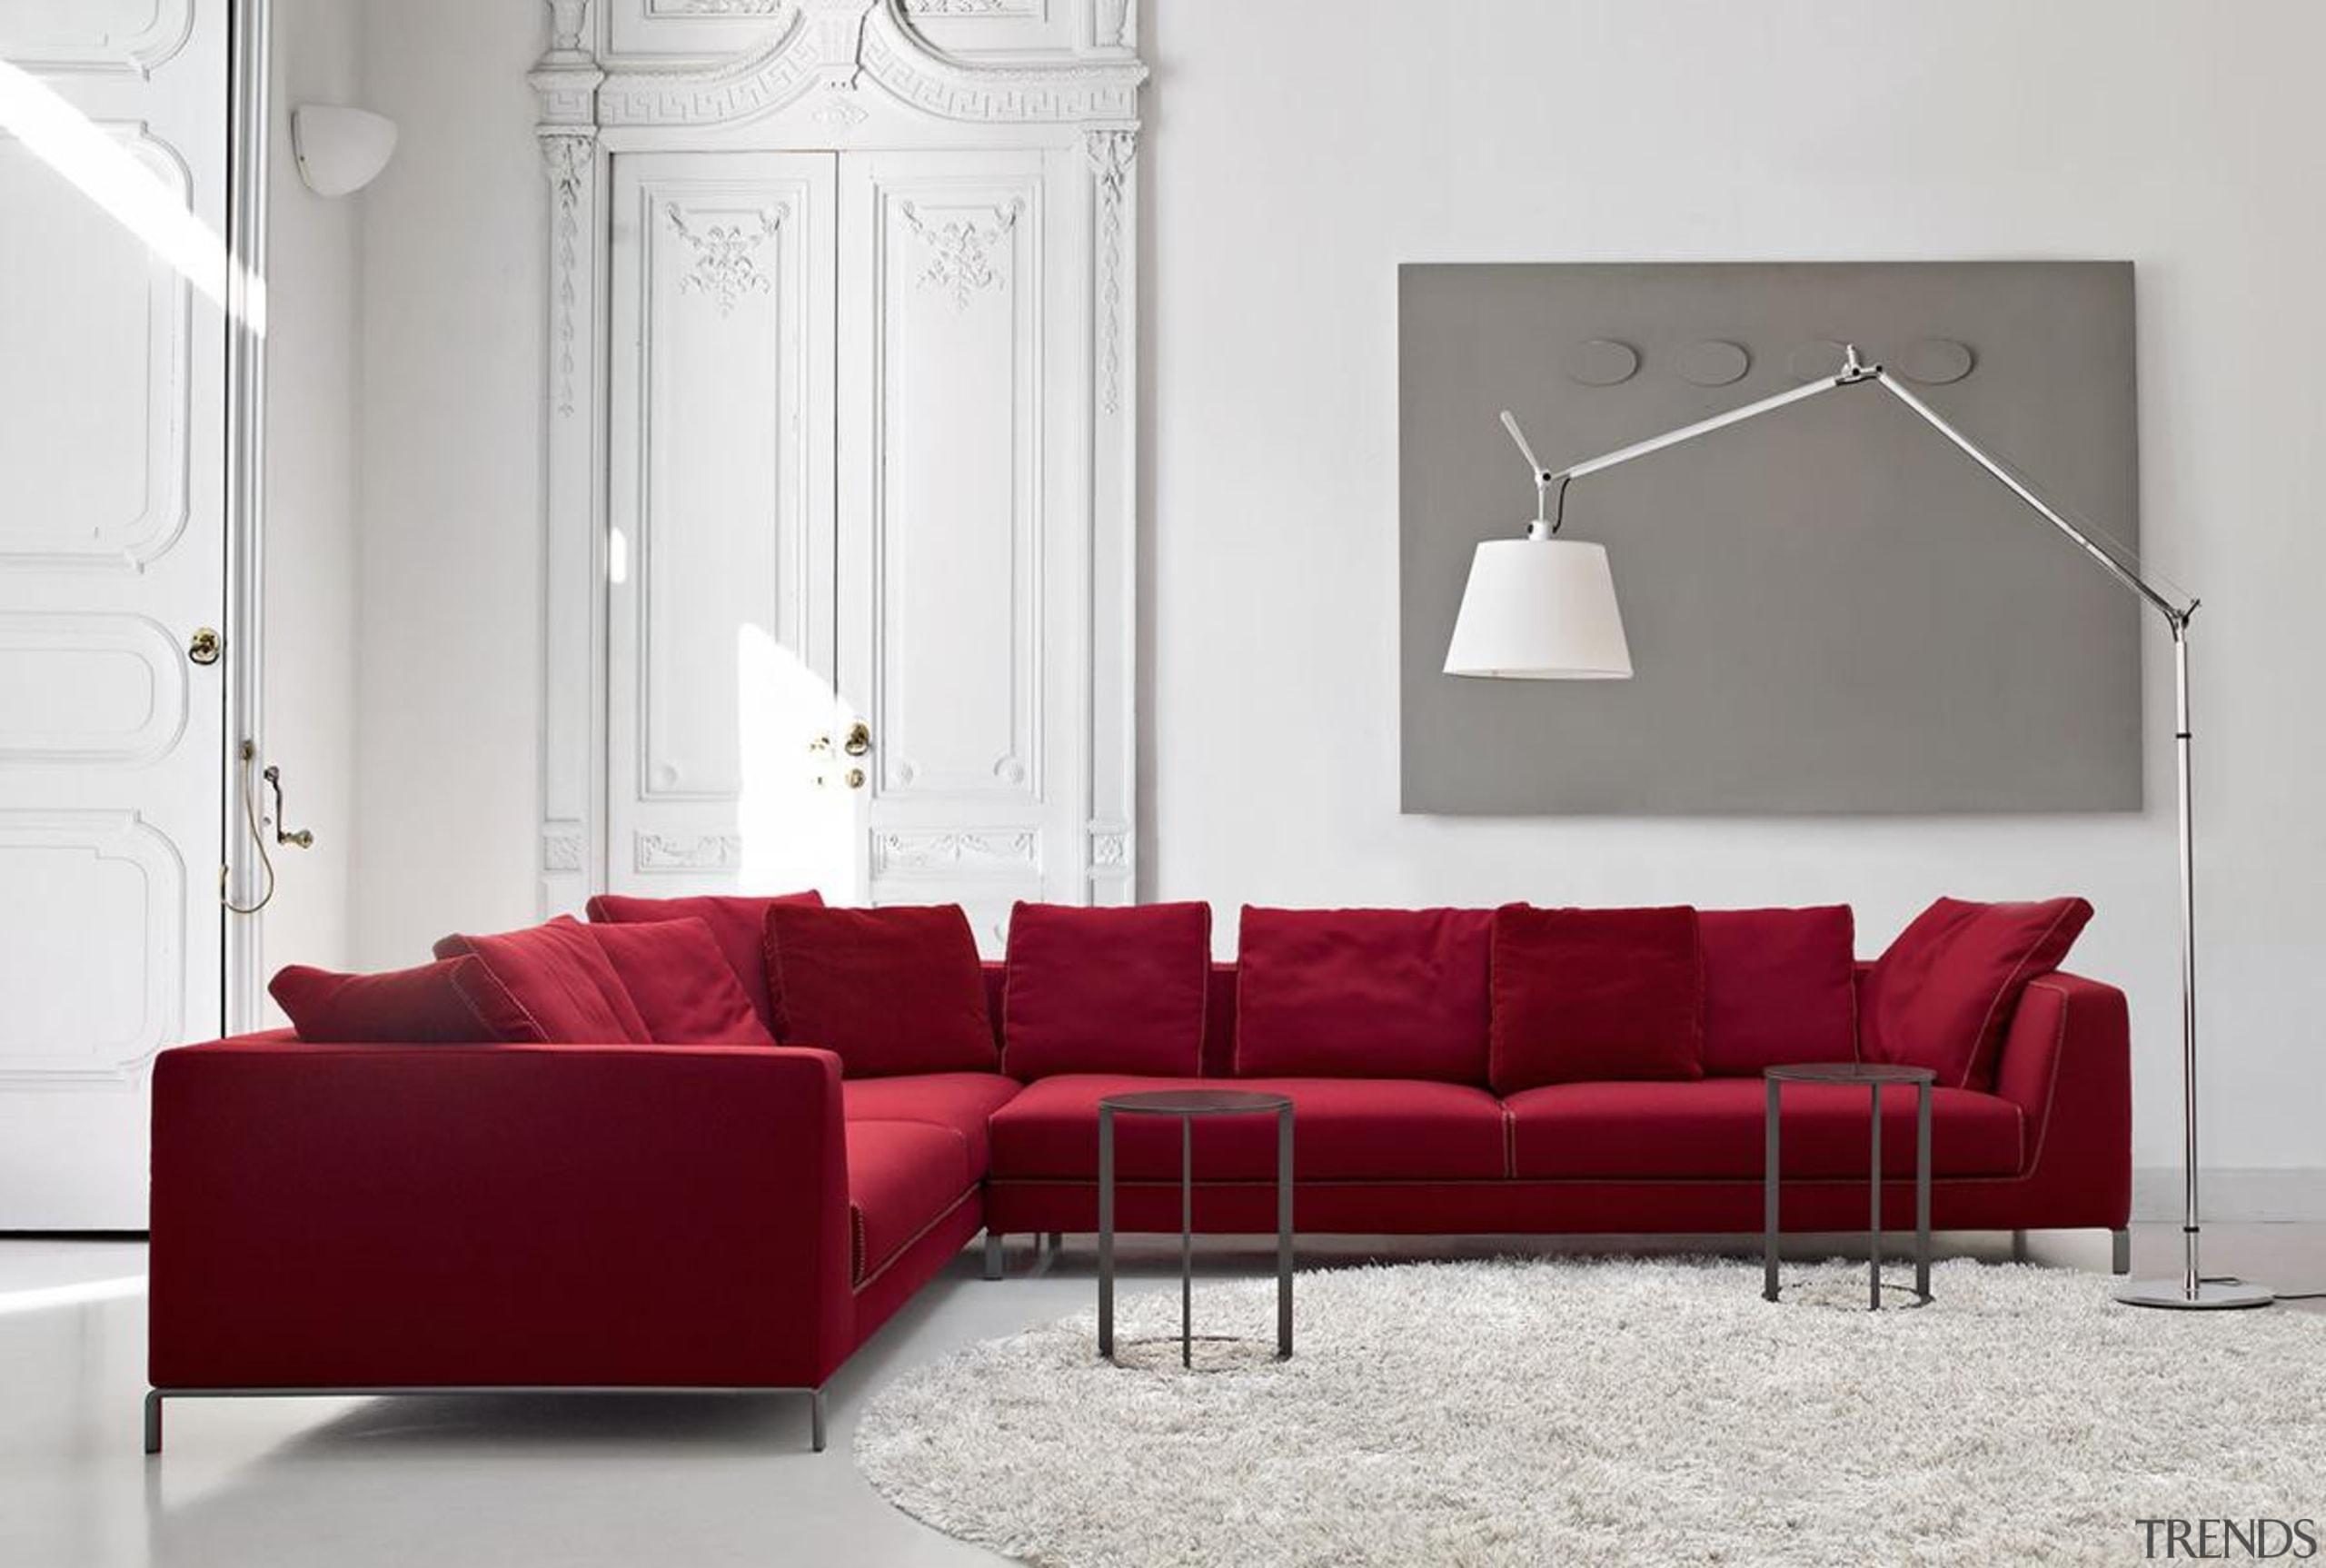 bebitaliacitterioraysofared1200.jpg - bebitaliacitterioraysofared1200.jpg - angle | chair | angle, chair, coffee table, couch, furniture, interior design, living room, loveseat, product design, sofa bed, table, white